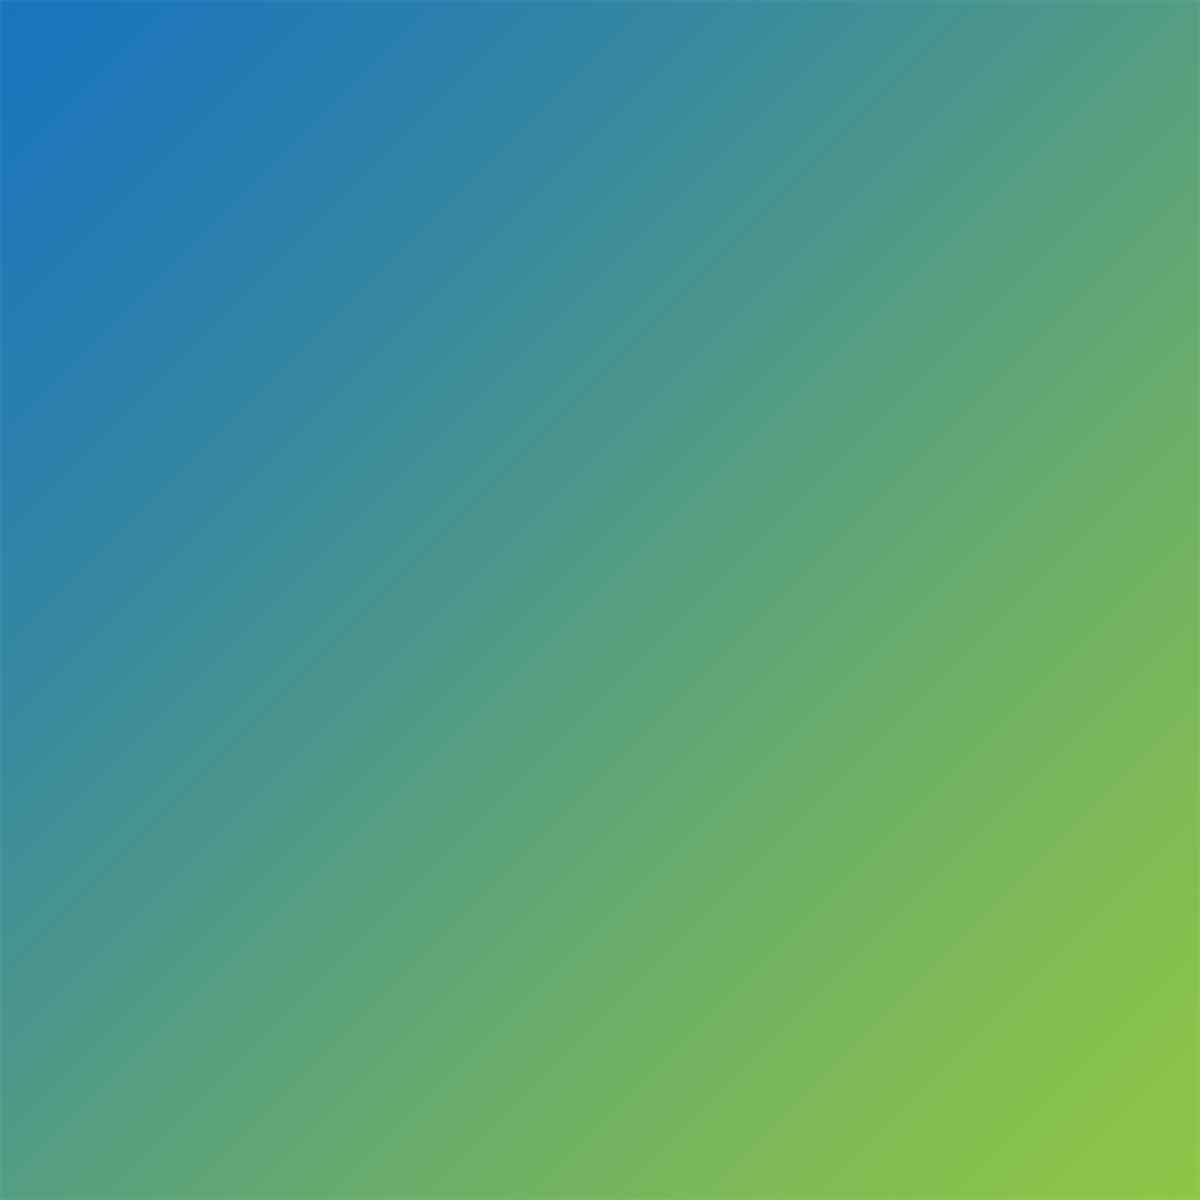 bgn image box gradient